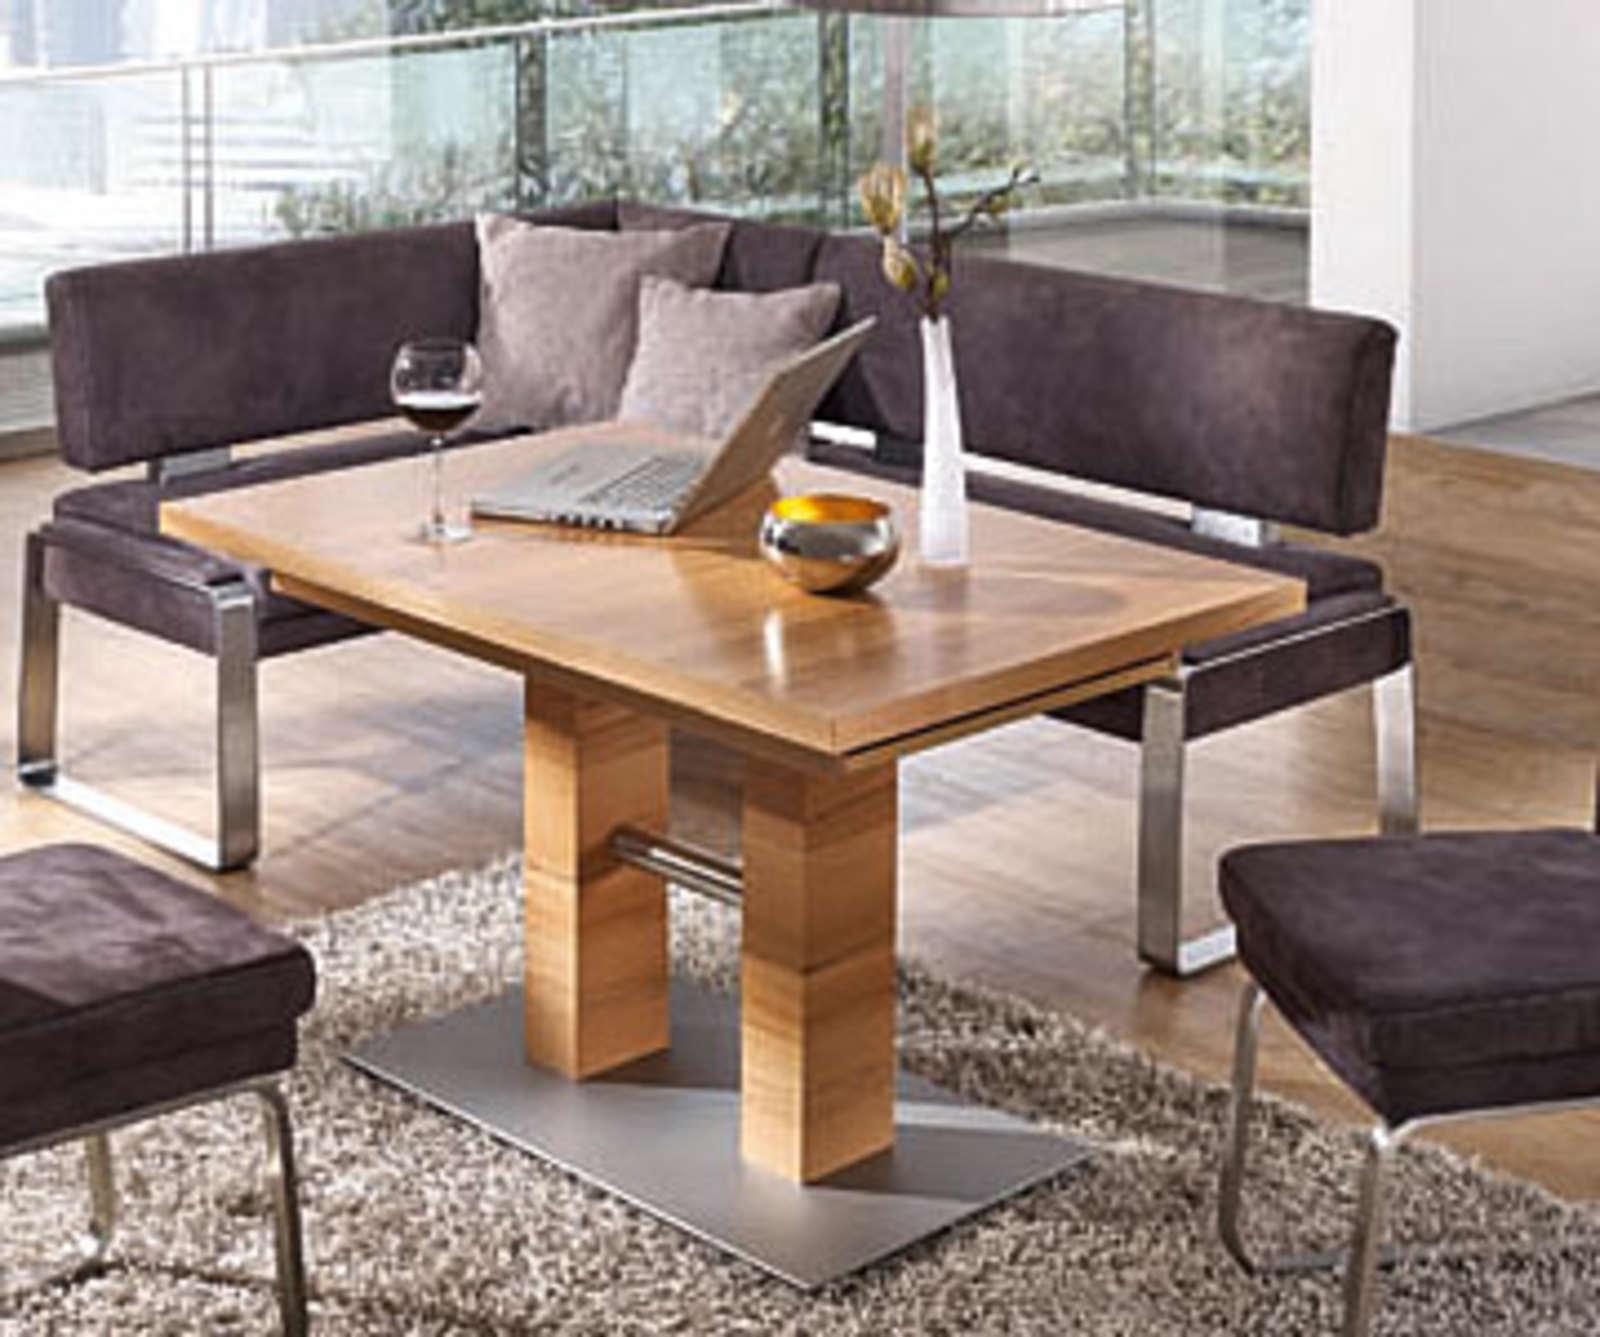 schaffrath kchen moers variano eckbank with schaffrath. Black Bedroom Furniture Sets. Home Design Ideas